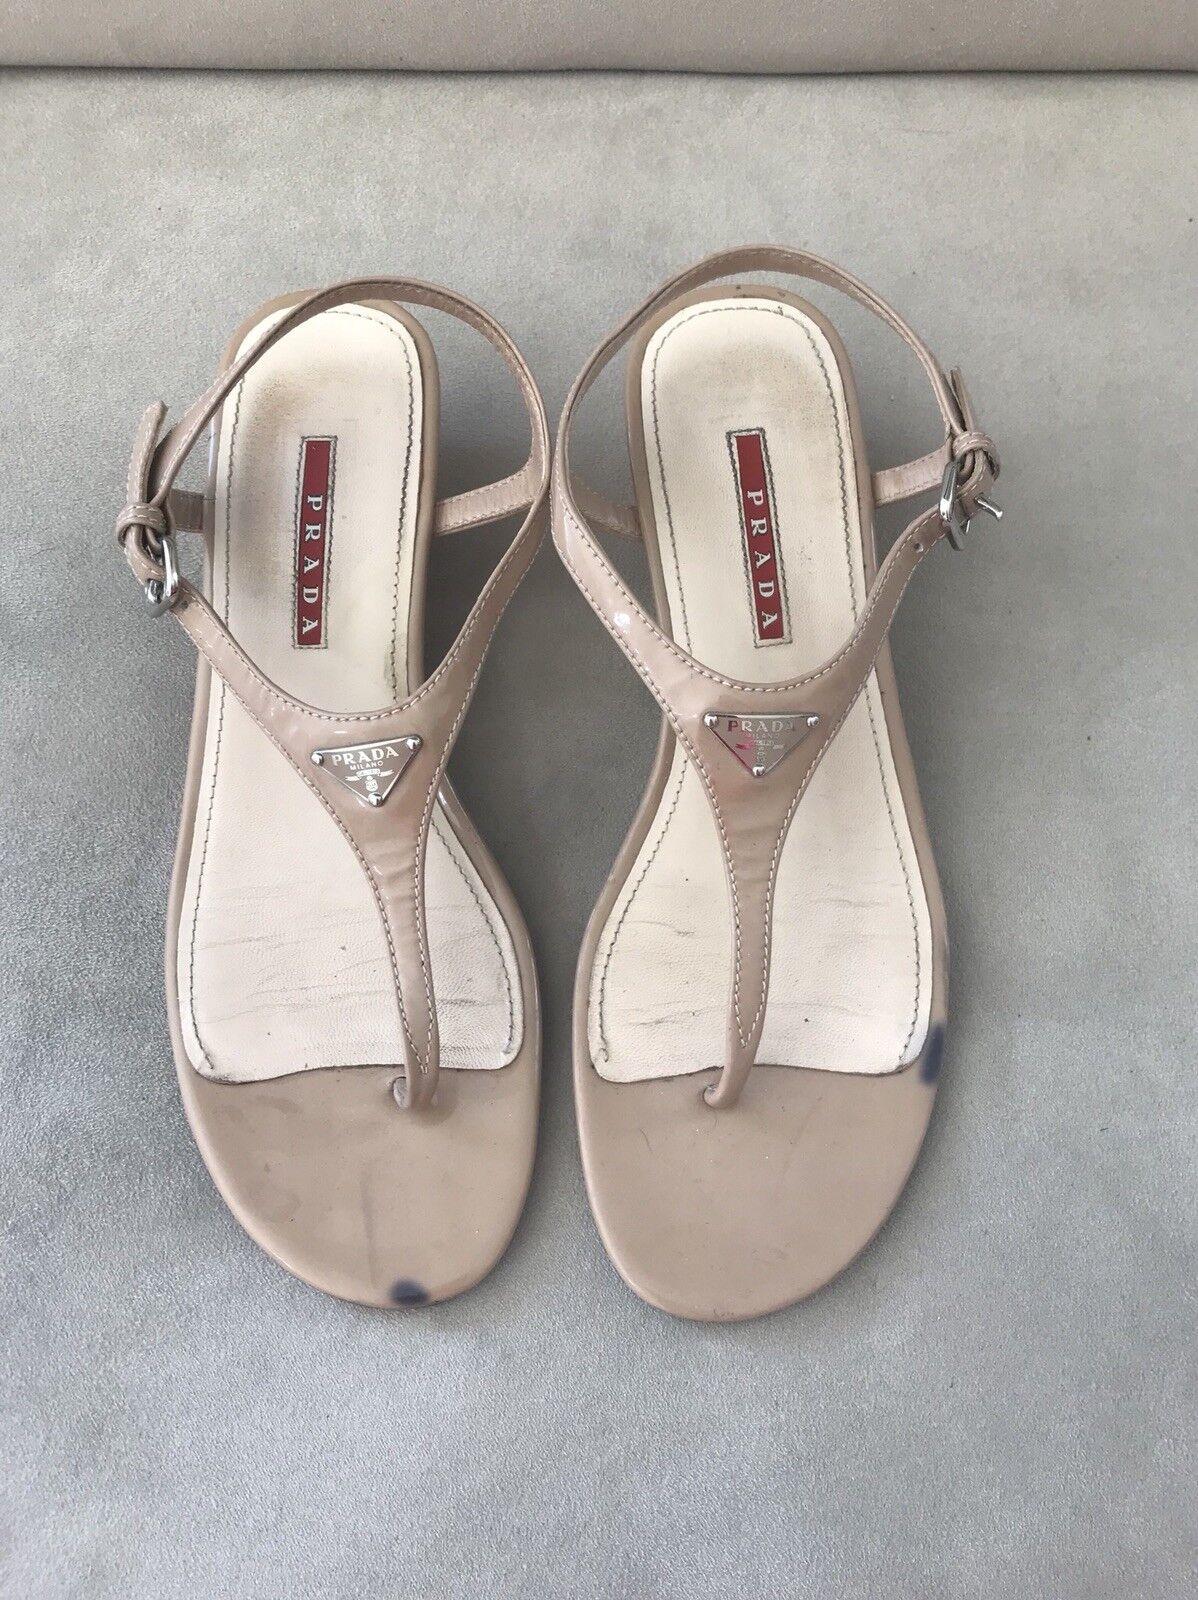 PRADA Nude Nude PRADA Patent Leather Sandlas Wedges Size 38.5EU 8f8609